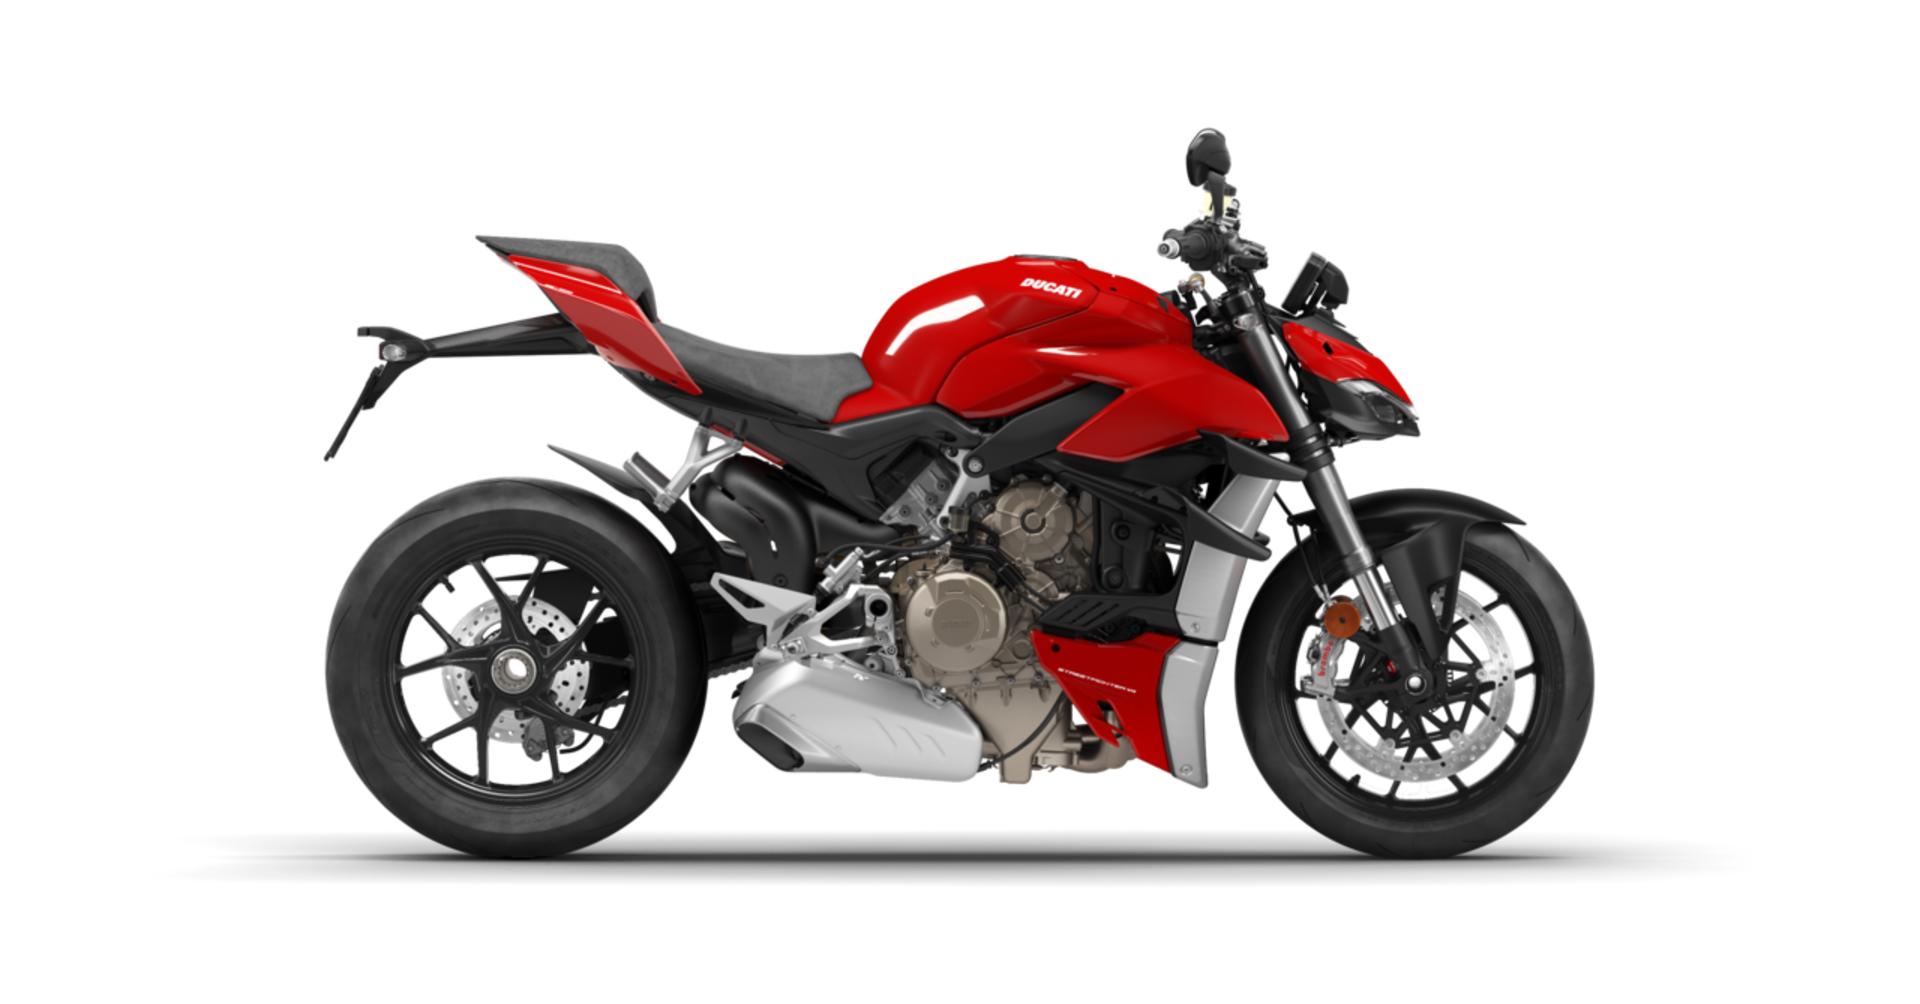 New Applications for Ducati Streetfighter V4